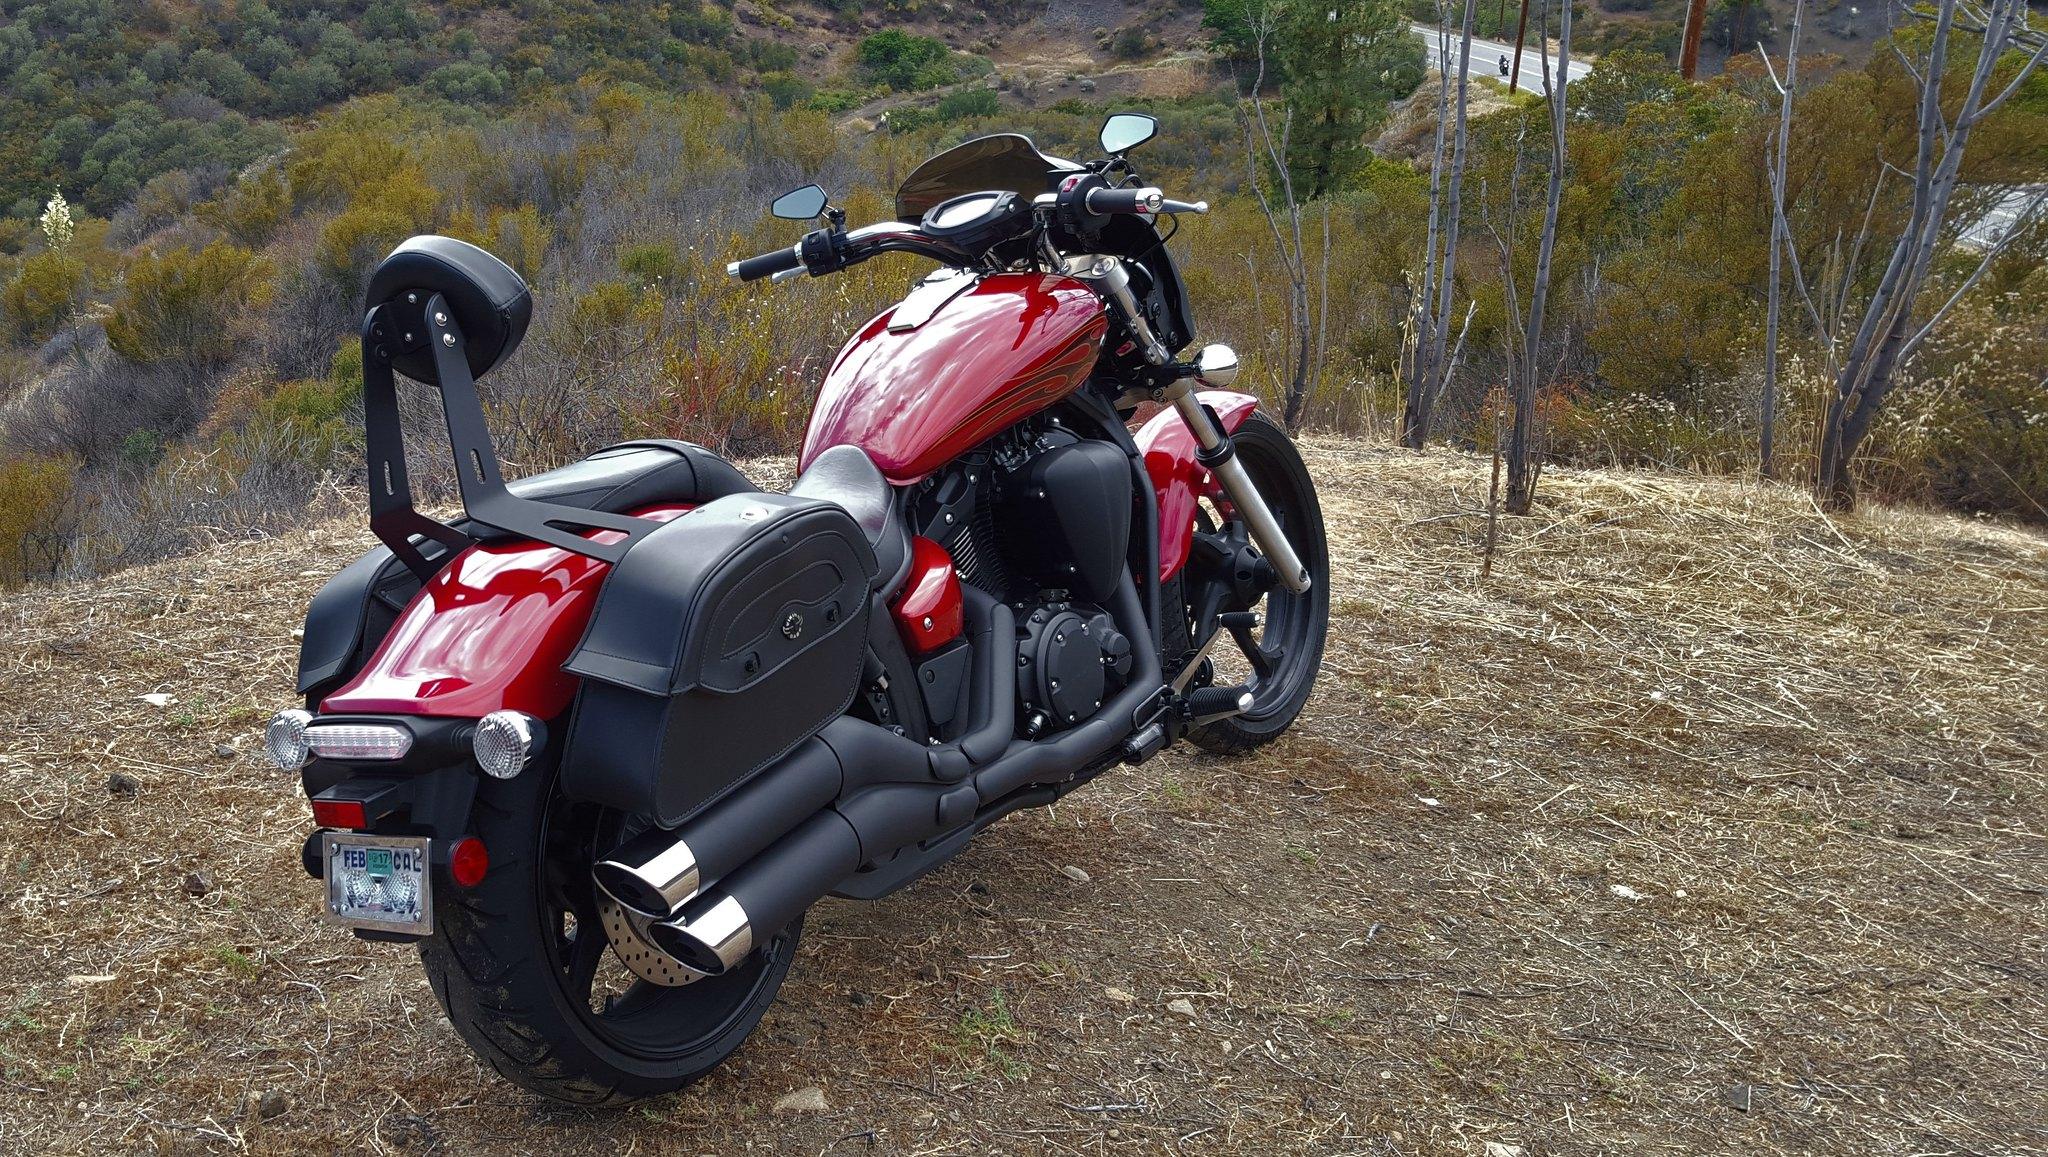 Viking bags yamaha star stryker motorcycle forum for Yamaha stryker saddlebags